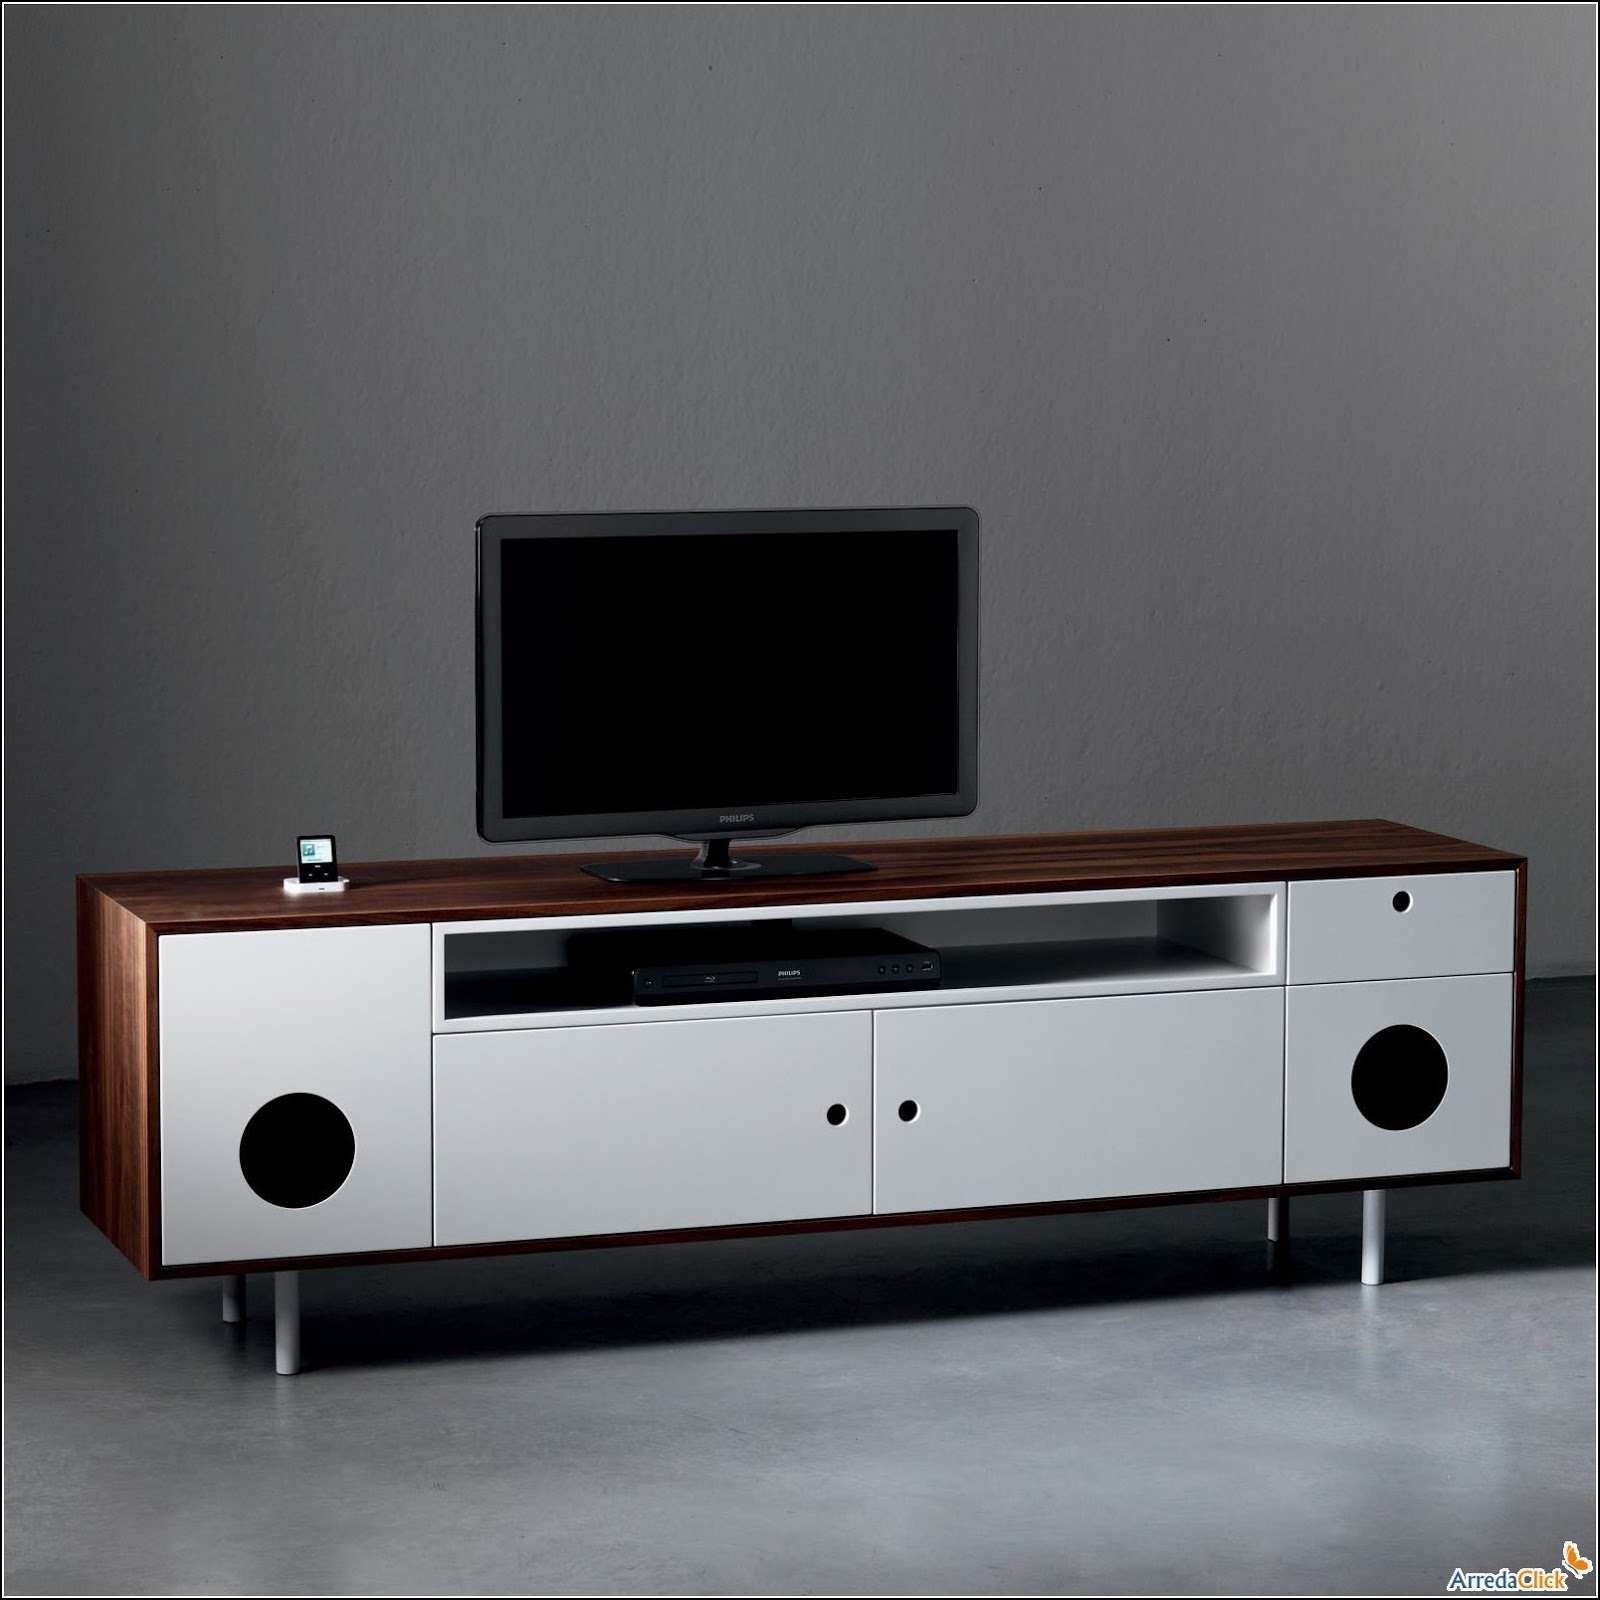 Arredaclick muebles italianos online muebles para televisor - Muebles para el televisor ...